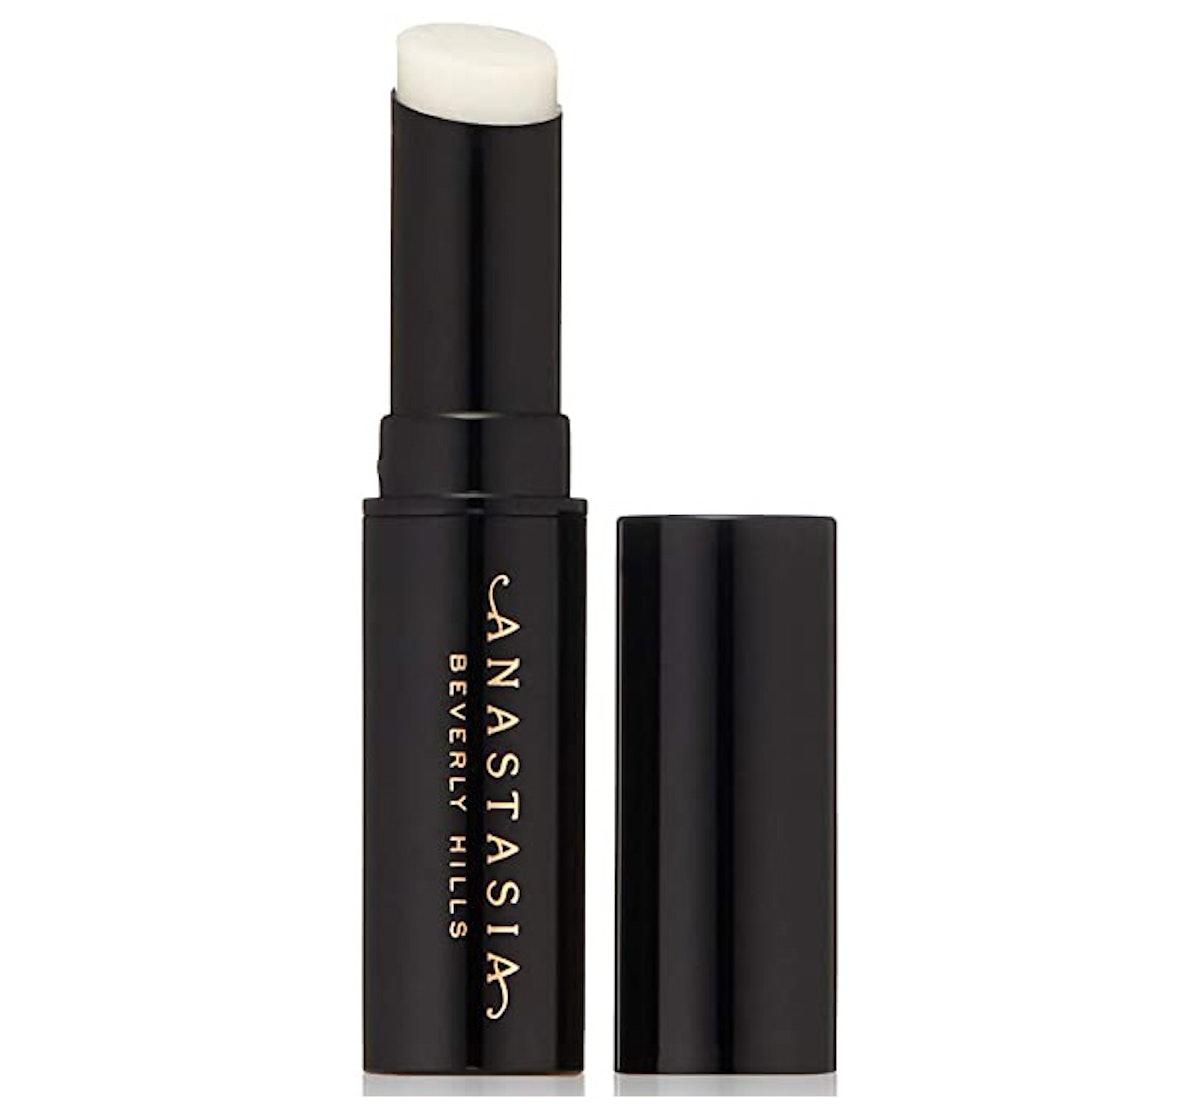 Anastasia Beverly Hills Lip Primer